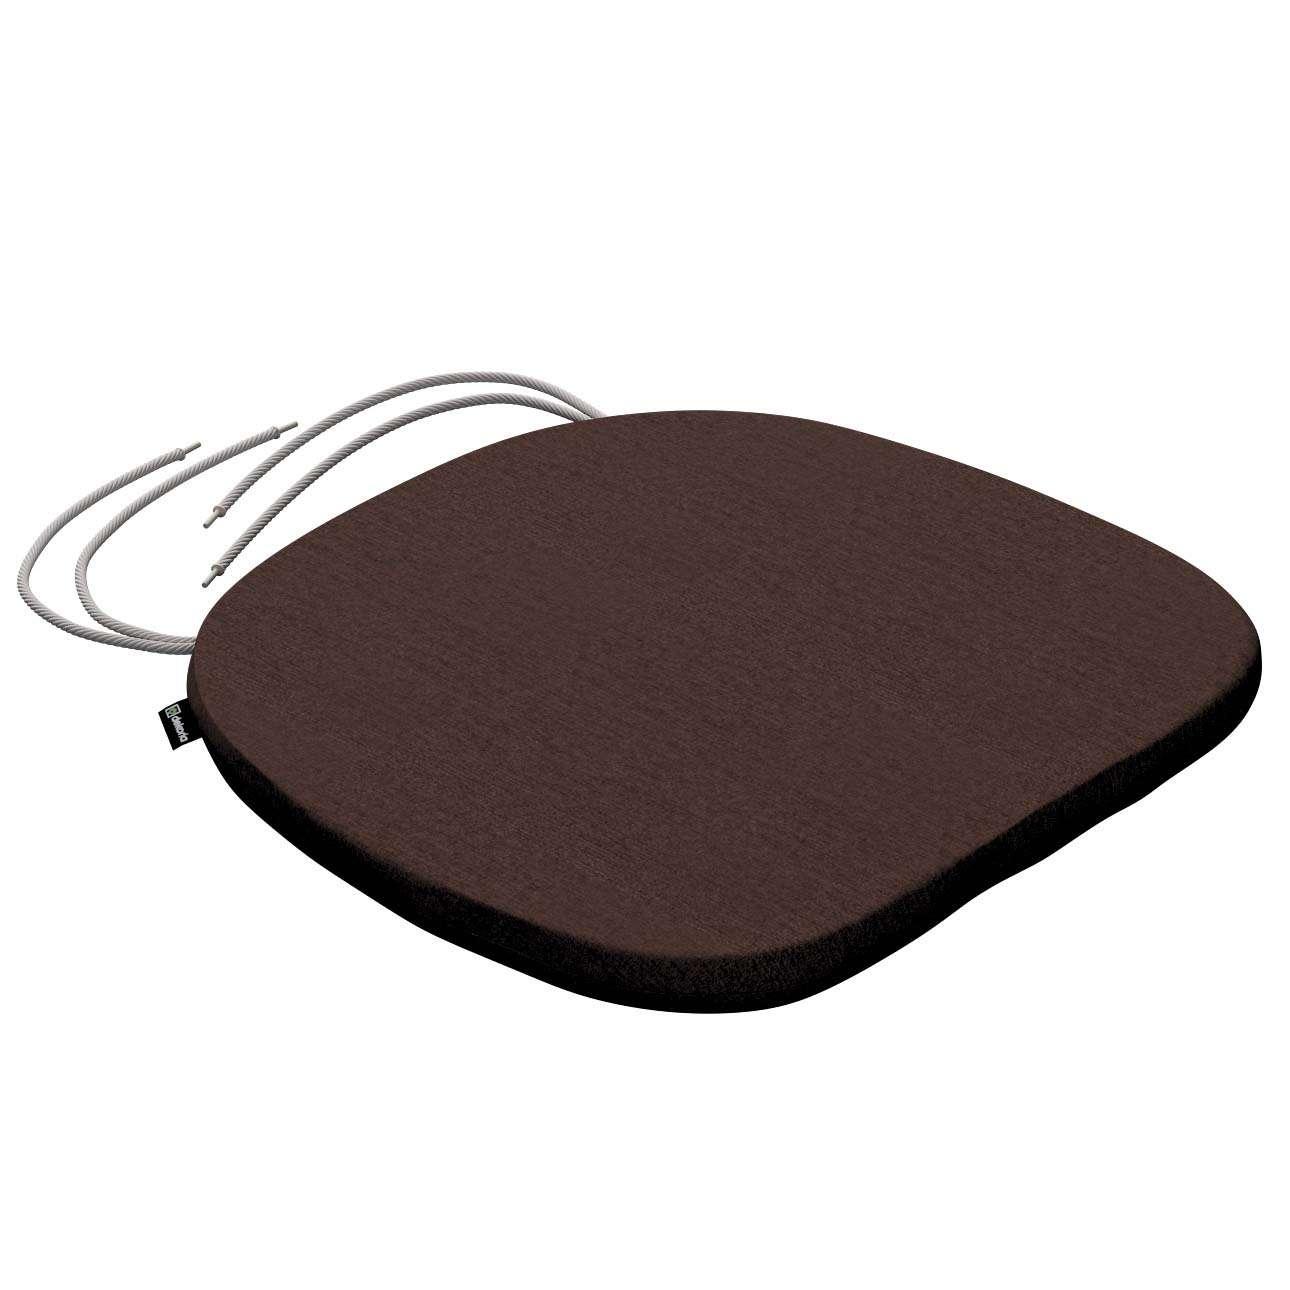 Kėdės pagalvėlė Bartek  40 x 37 x 2,5 cm kolekcijoje Chenille, audinys: 702-18